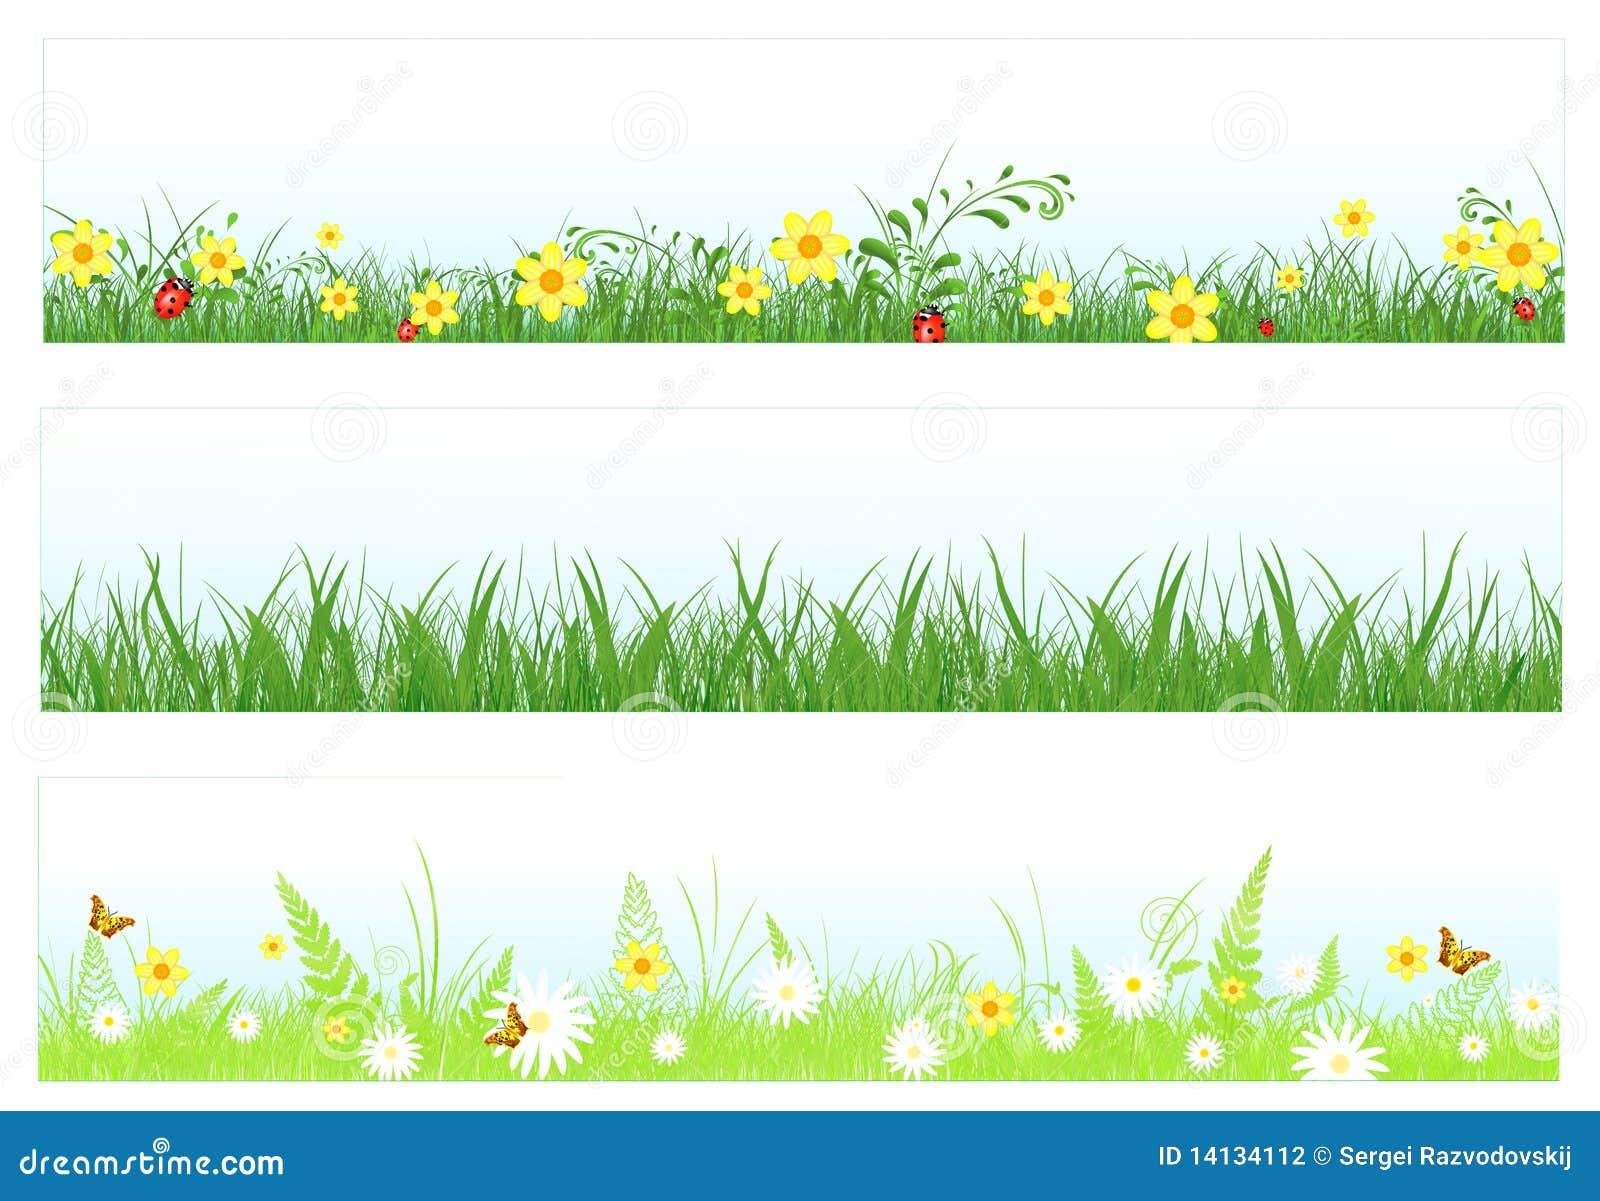 grass web banners stock vector illustration of fresh